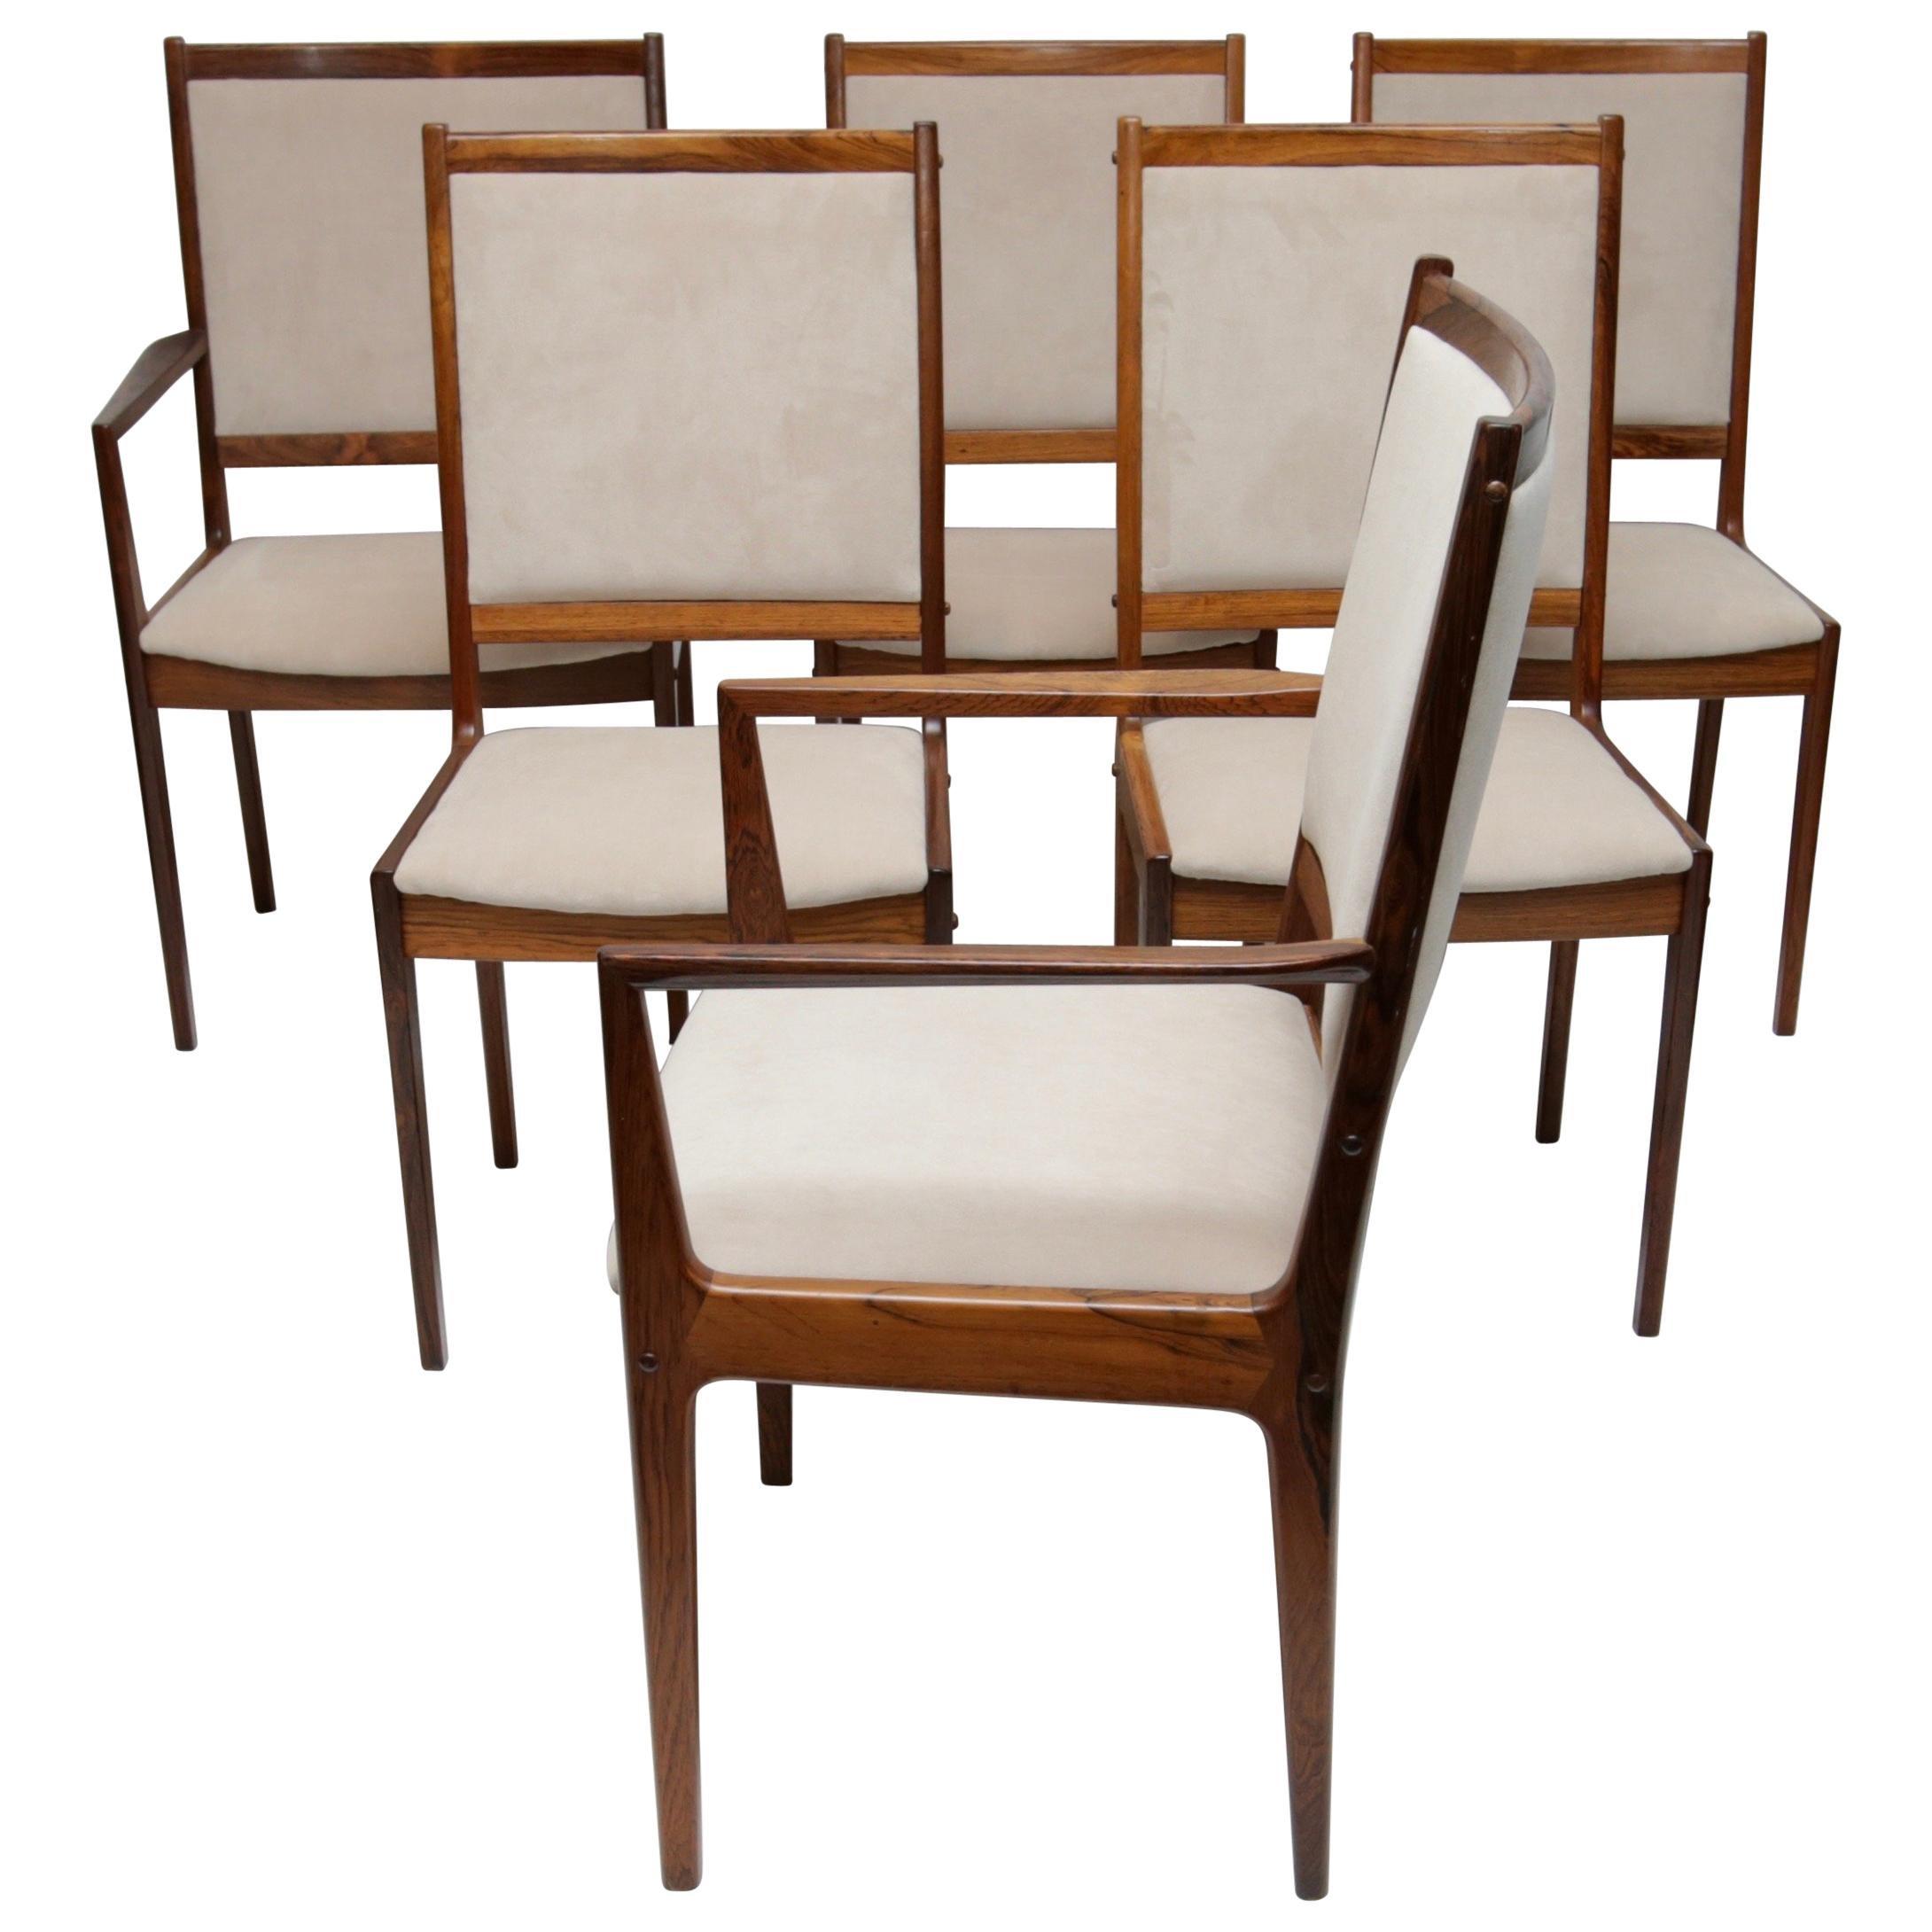 Set Of 6 Danish Modern Rosewood Chairs By Bernhard Pedersen For Sale